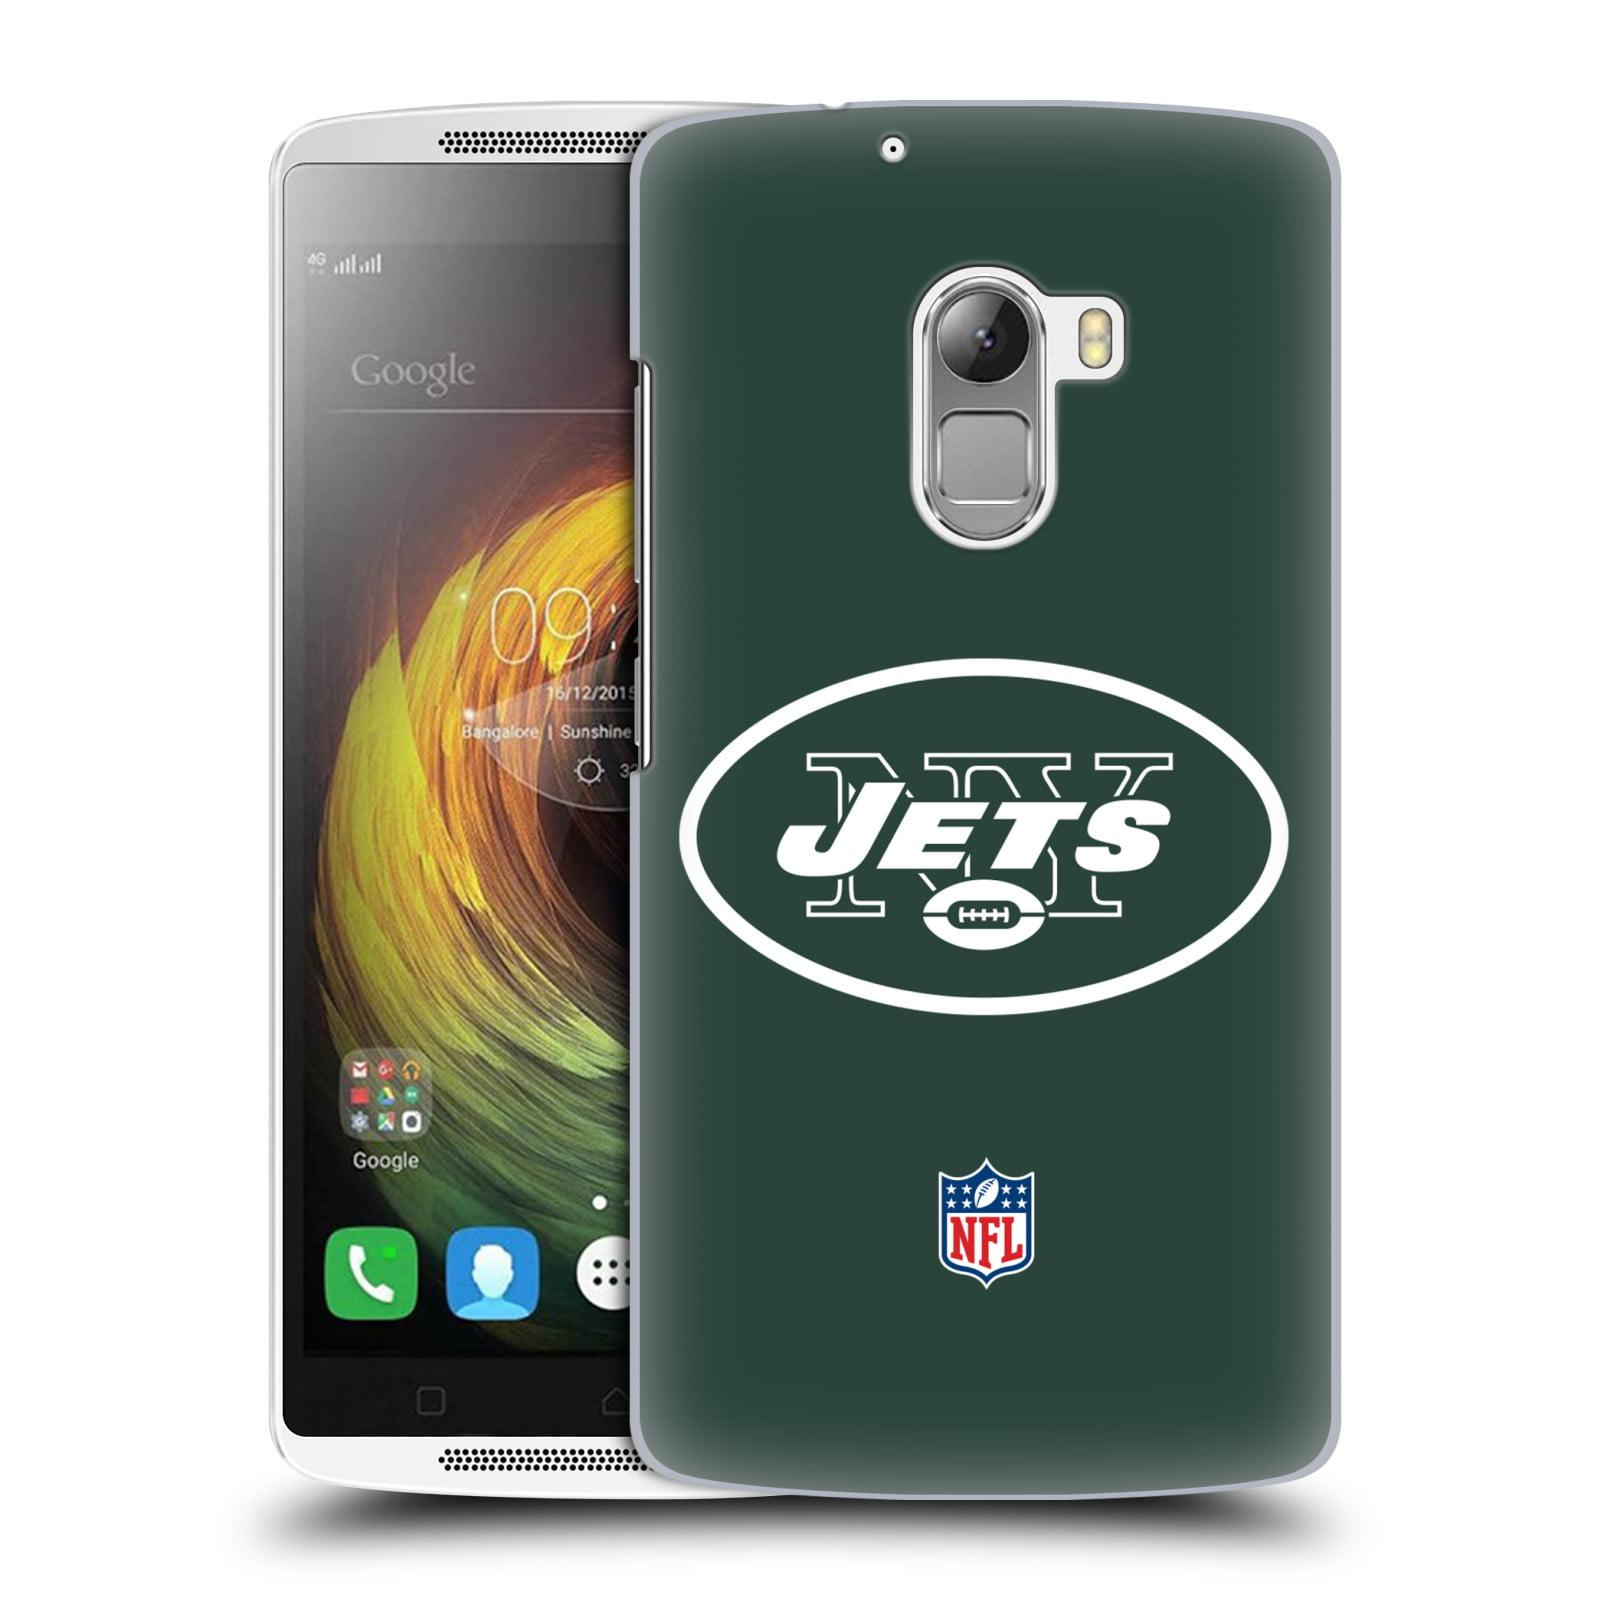 OFFICIAL NFL NEW YORK JETS LOGO HARD BACK CASE FOR LENOVO PHONES